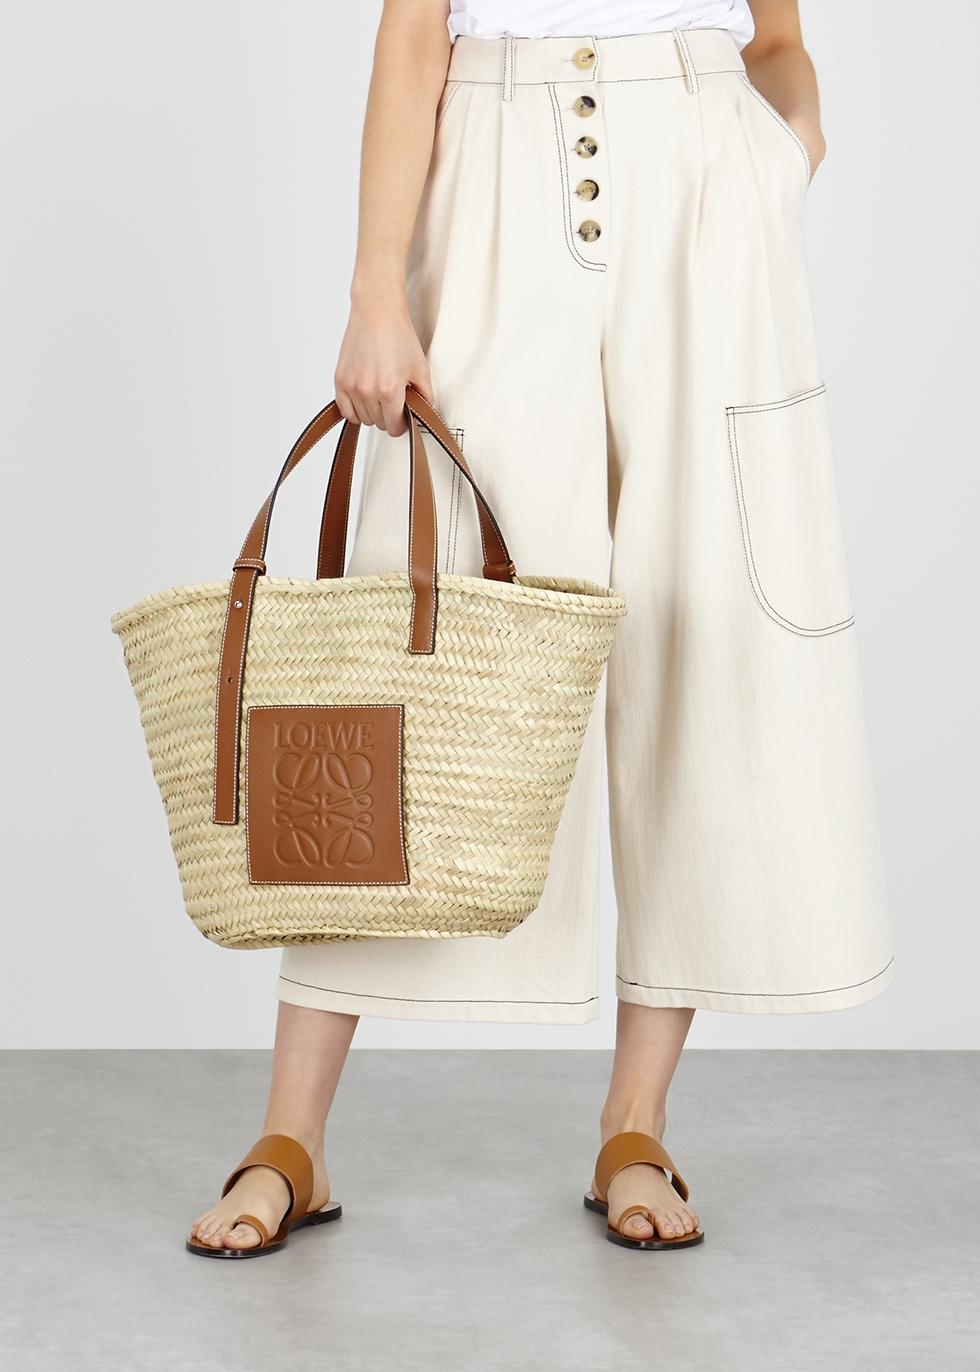 bdc0032e41e Loewe Large cream raffia basket bag - Harvey Nichols